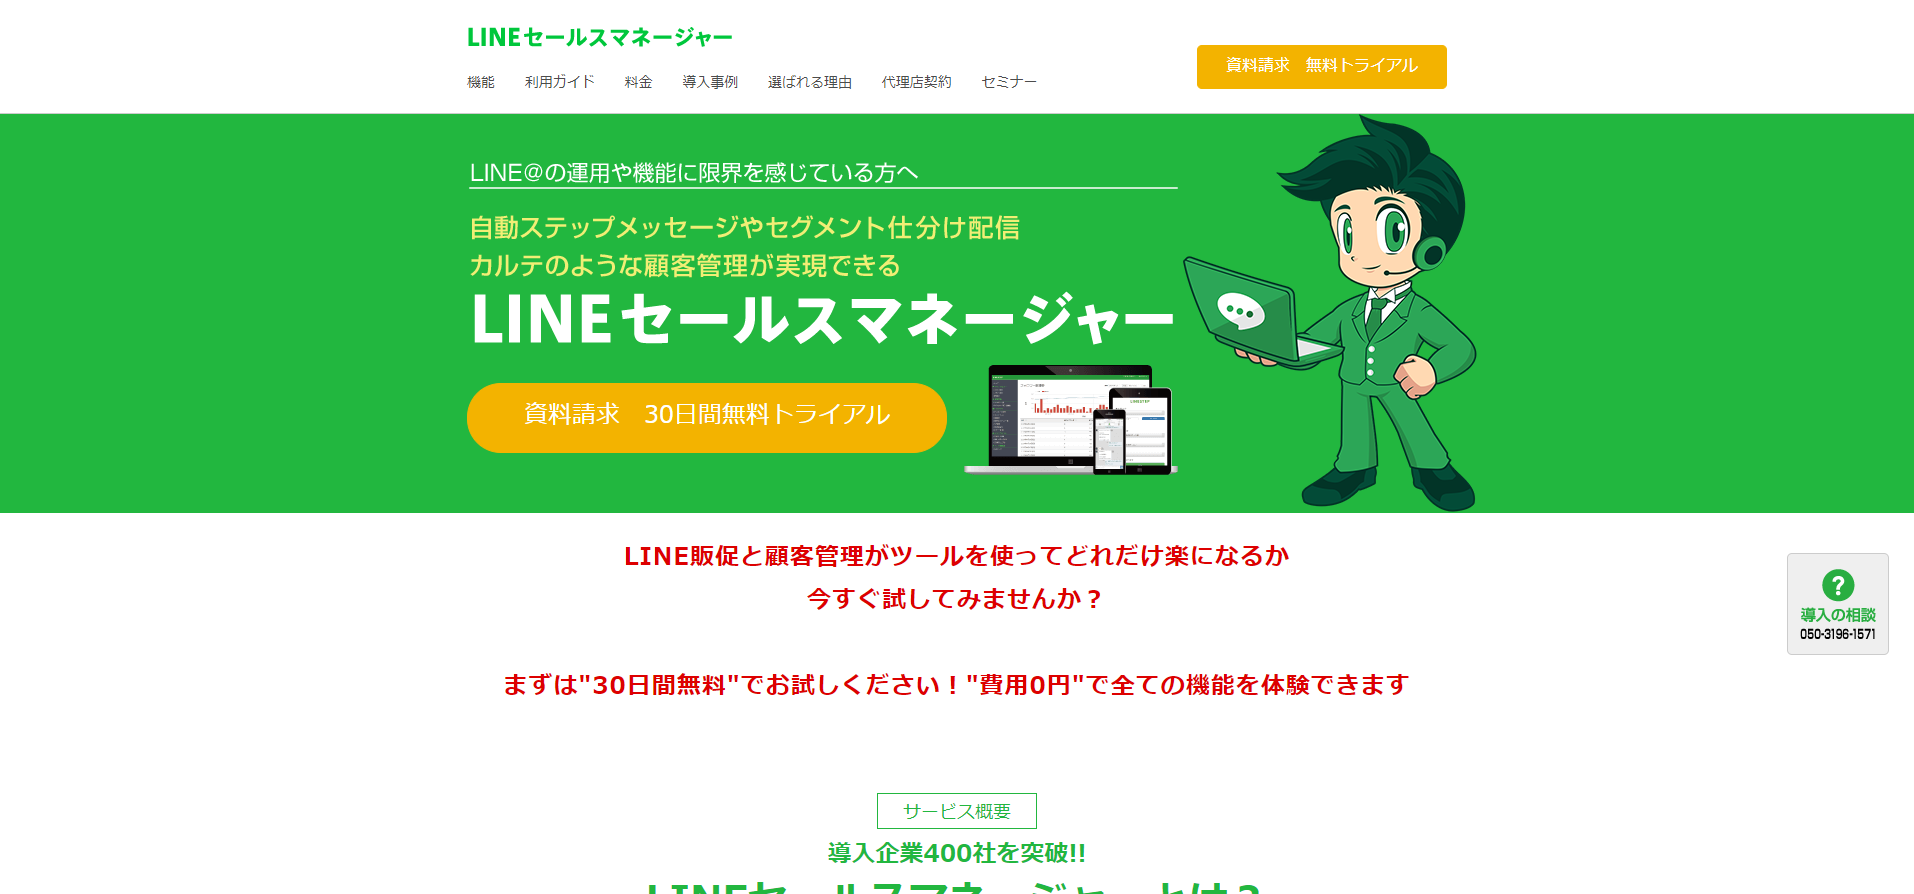 LINE@ 代理店